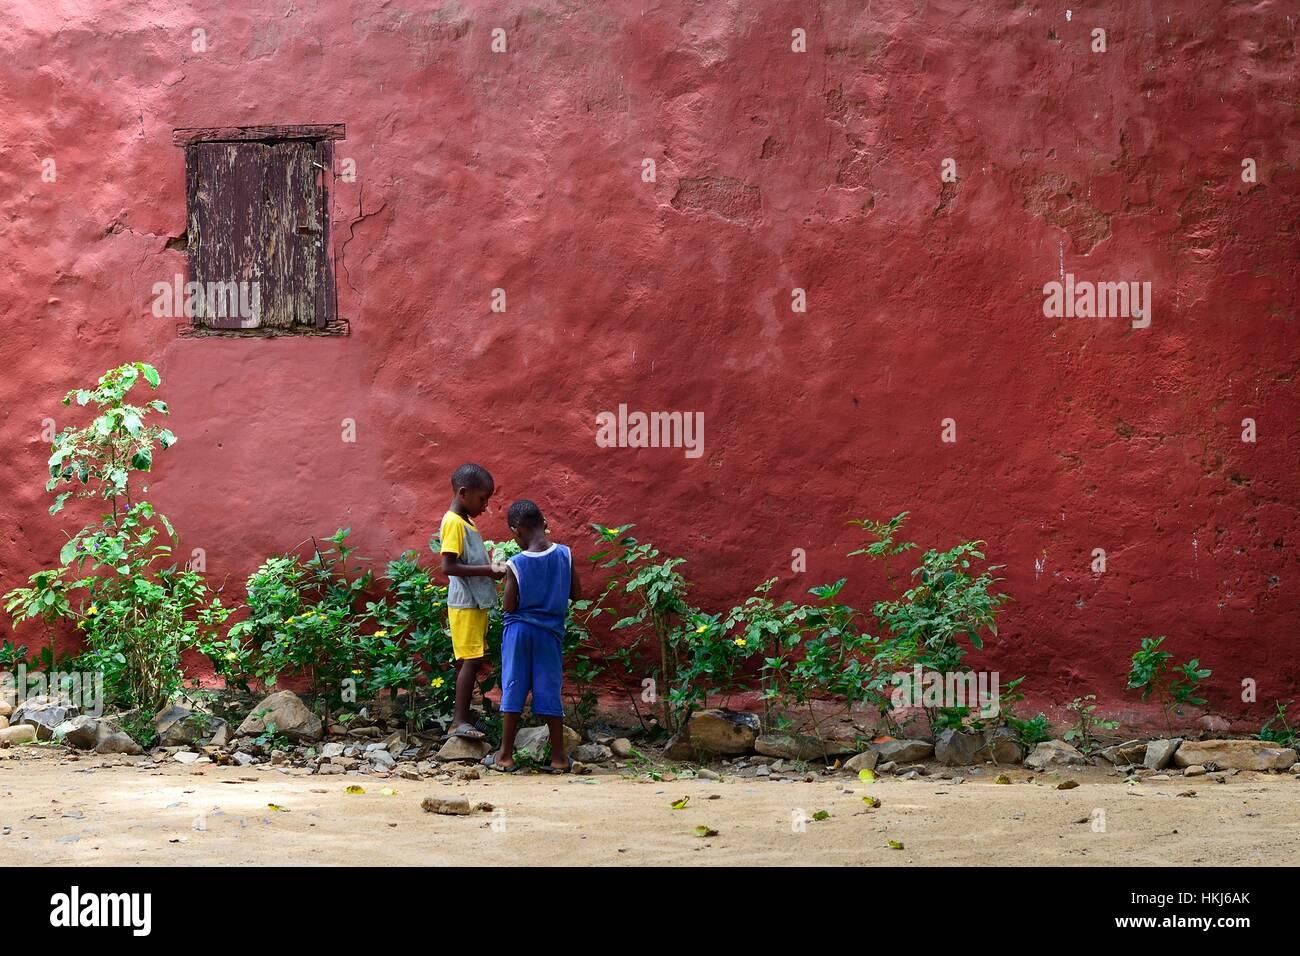 Two children in front of a red house facade, Île de Gorée, Dakar, Senegal - Stock Image